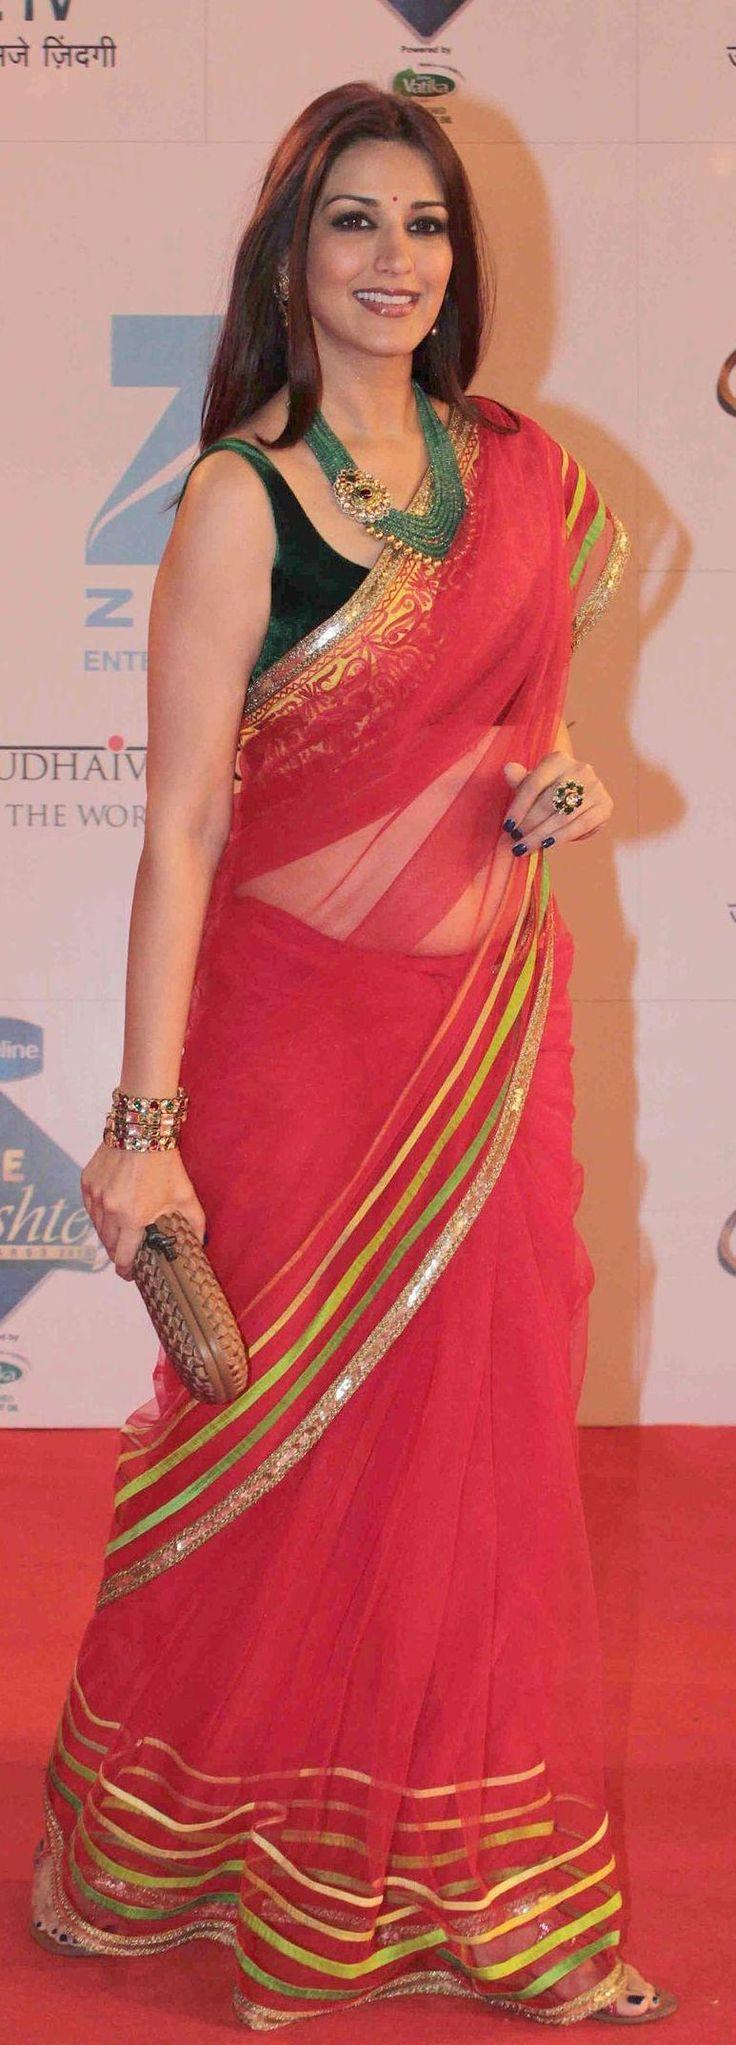 Pinterest @Littlehub || Six yard- The Saree ❤•。*゚||  Sonali bendre in a bright color saree